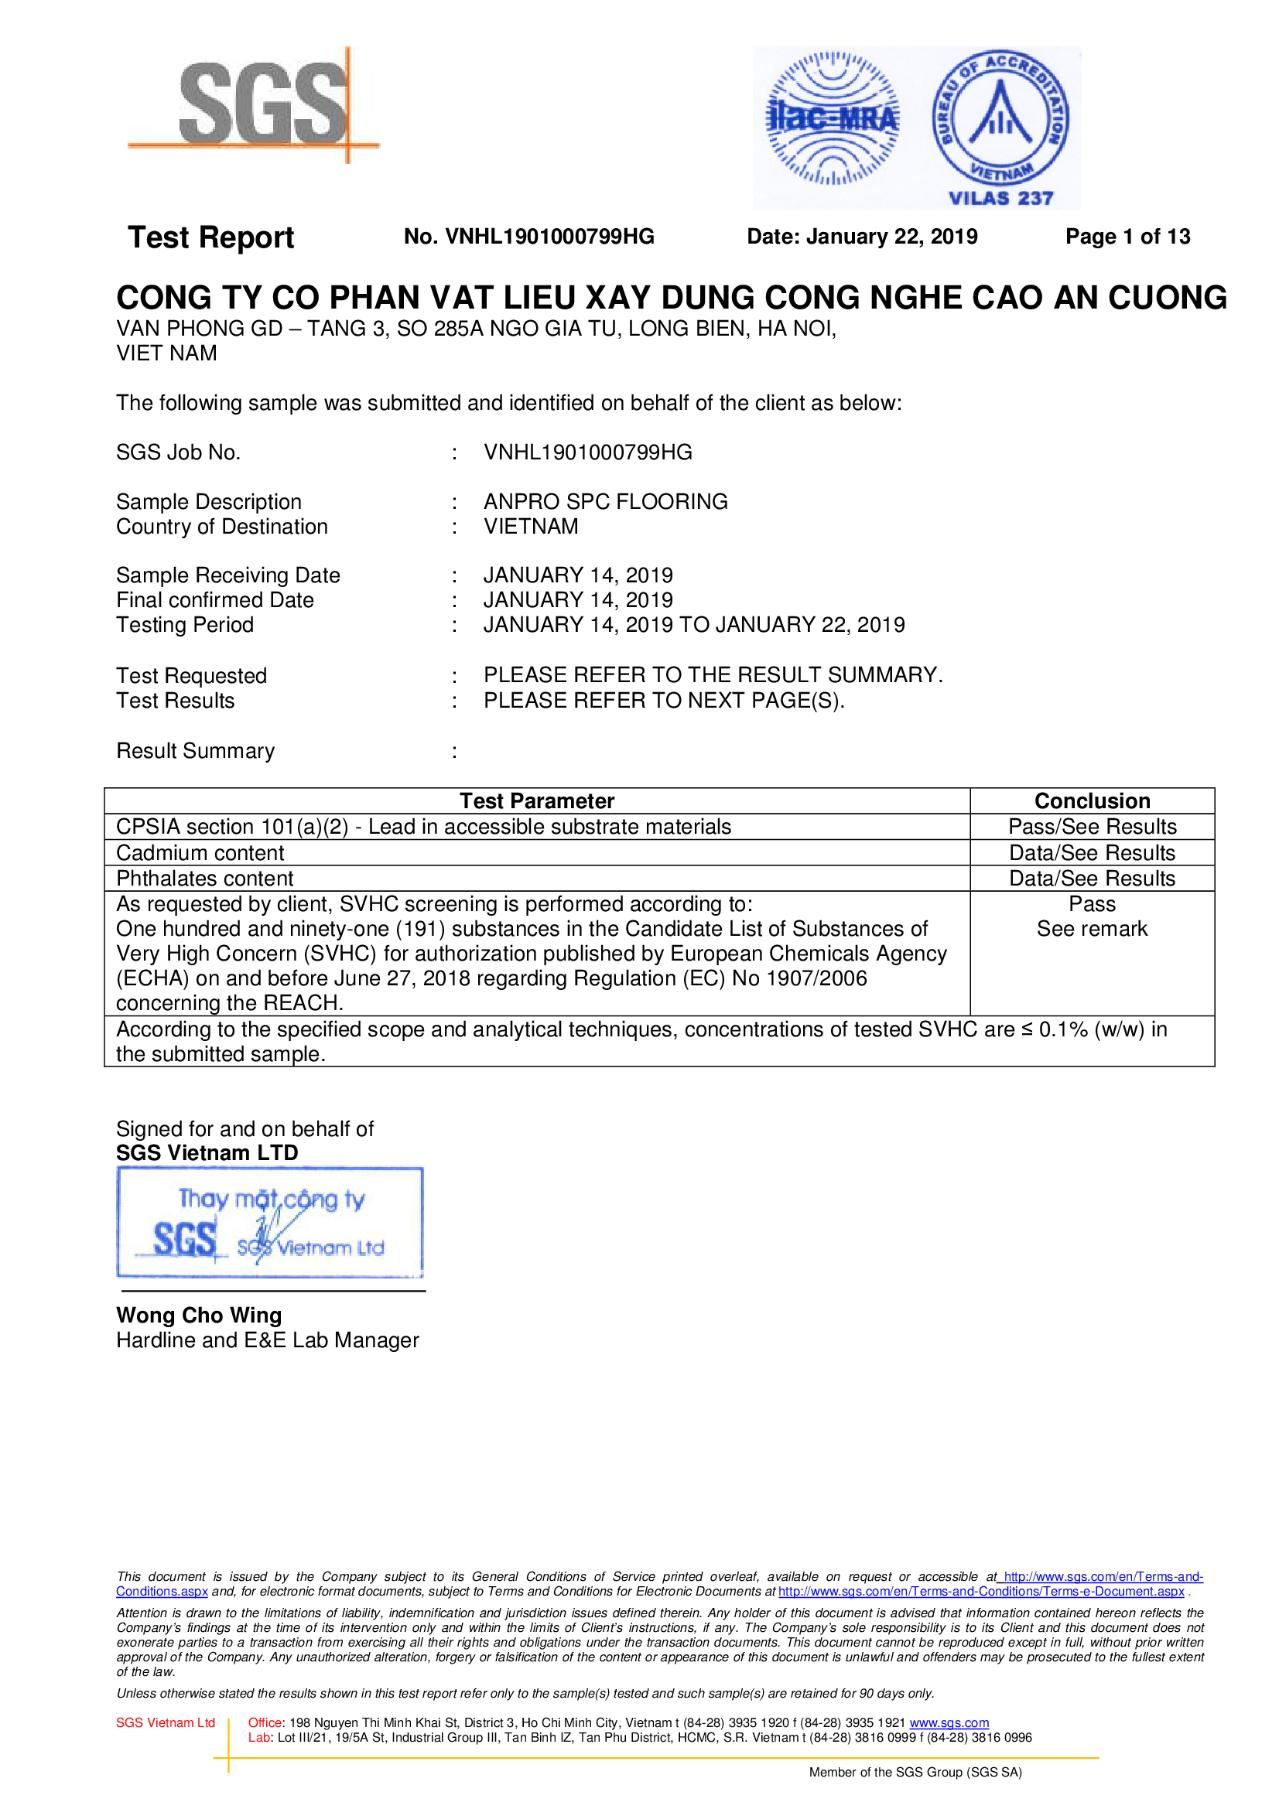 99eb4265cf9241c5f46ae8e4f51dcaeawYEvA8301XadTIvy 0 1 - QUALITY CONTROL